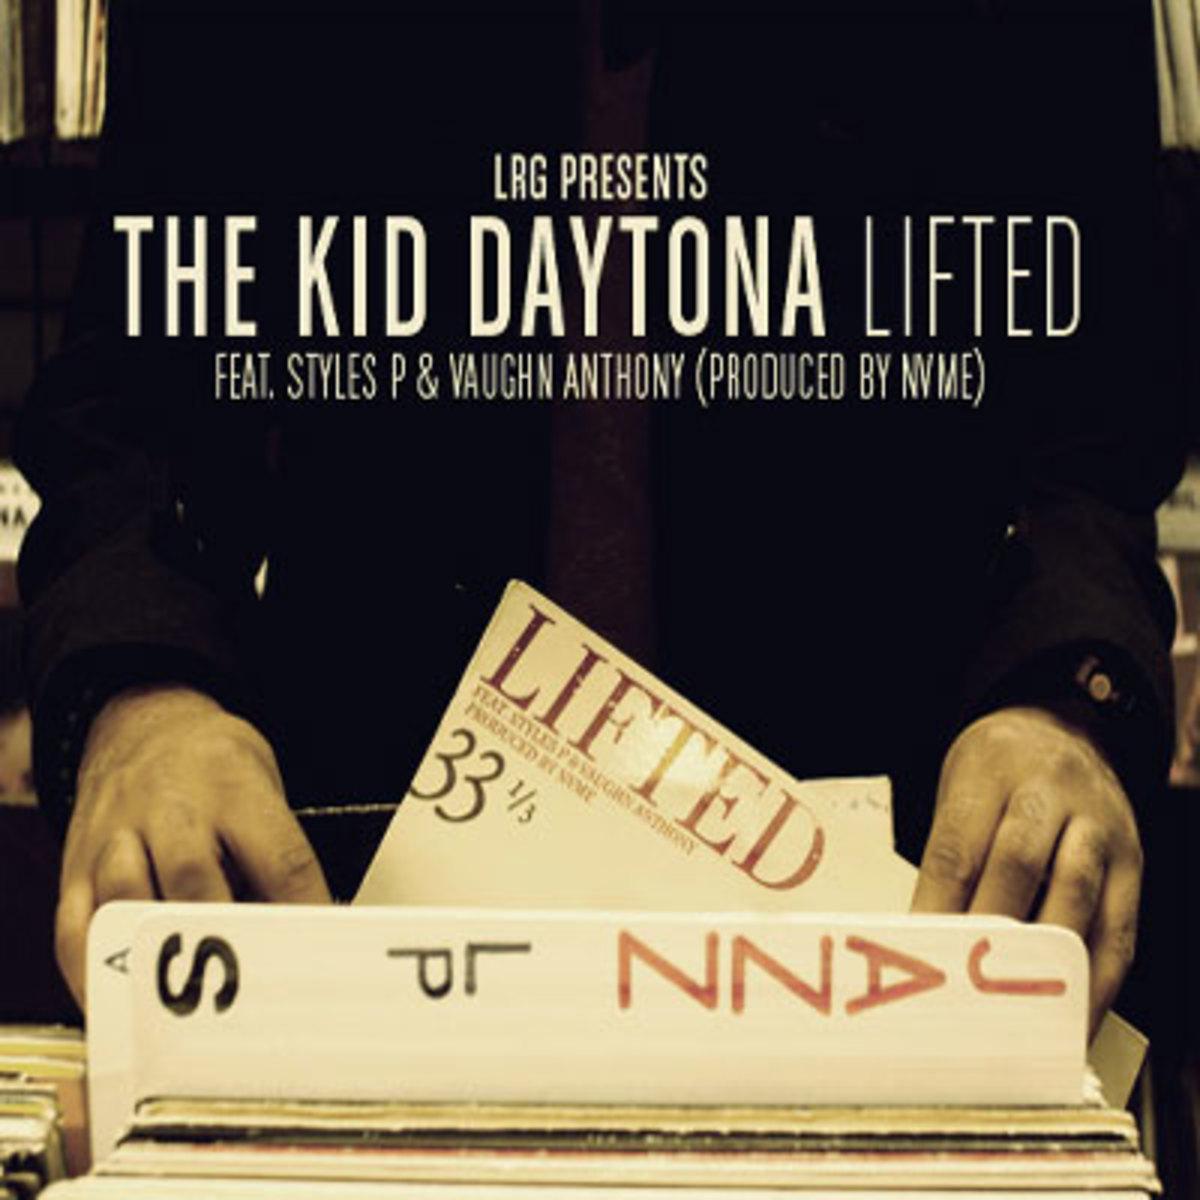 thekiddaytona-lifed.jpg